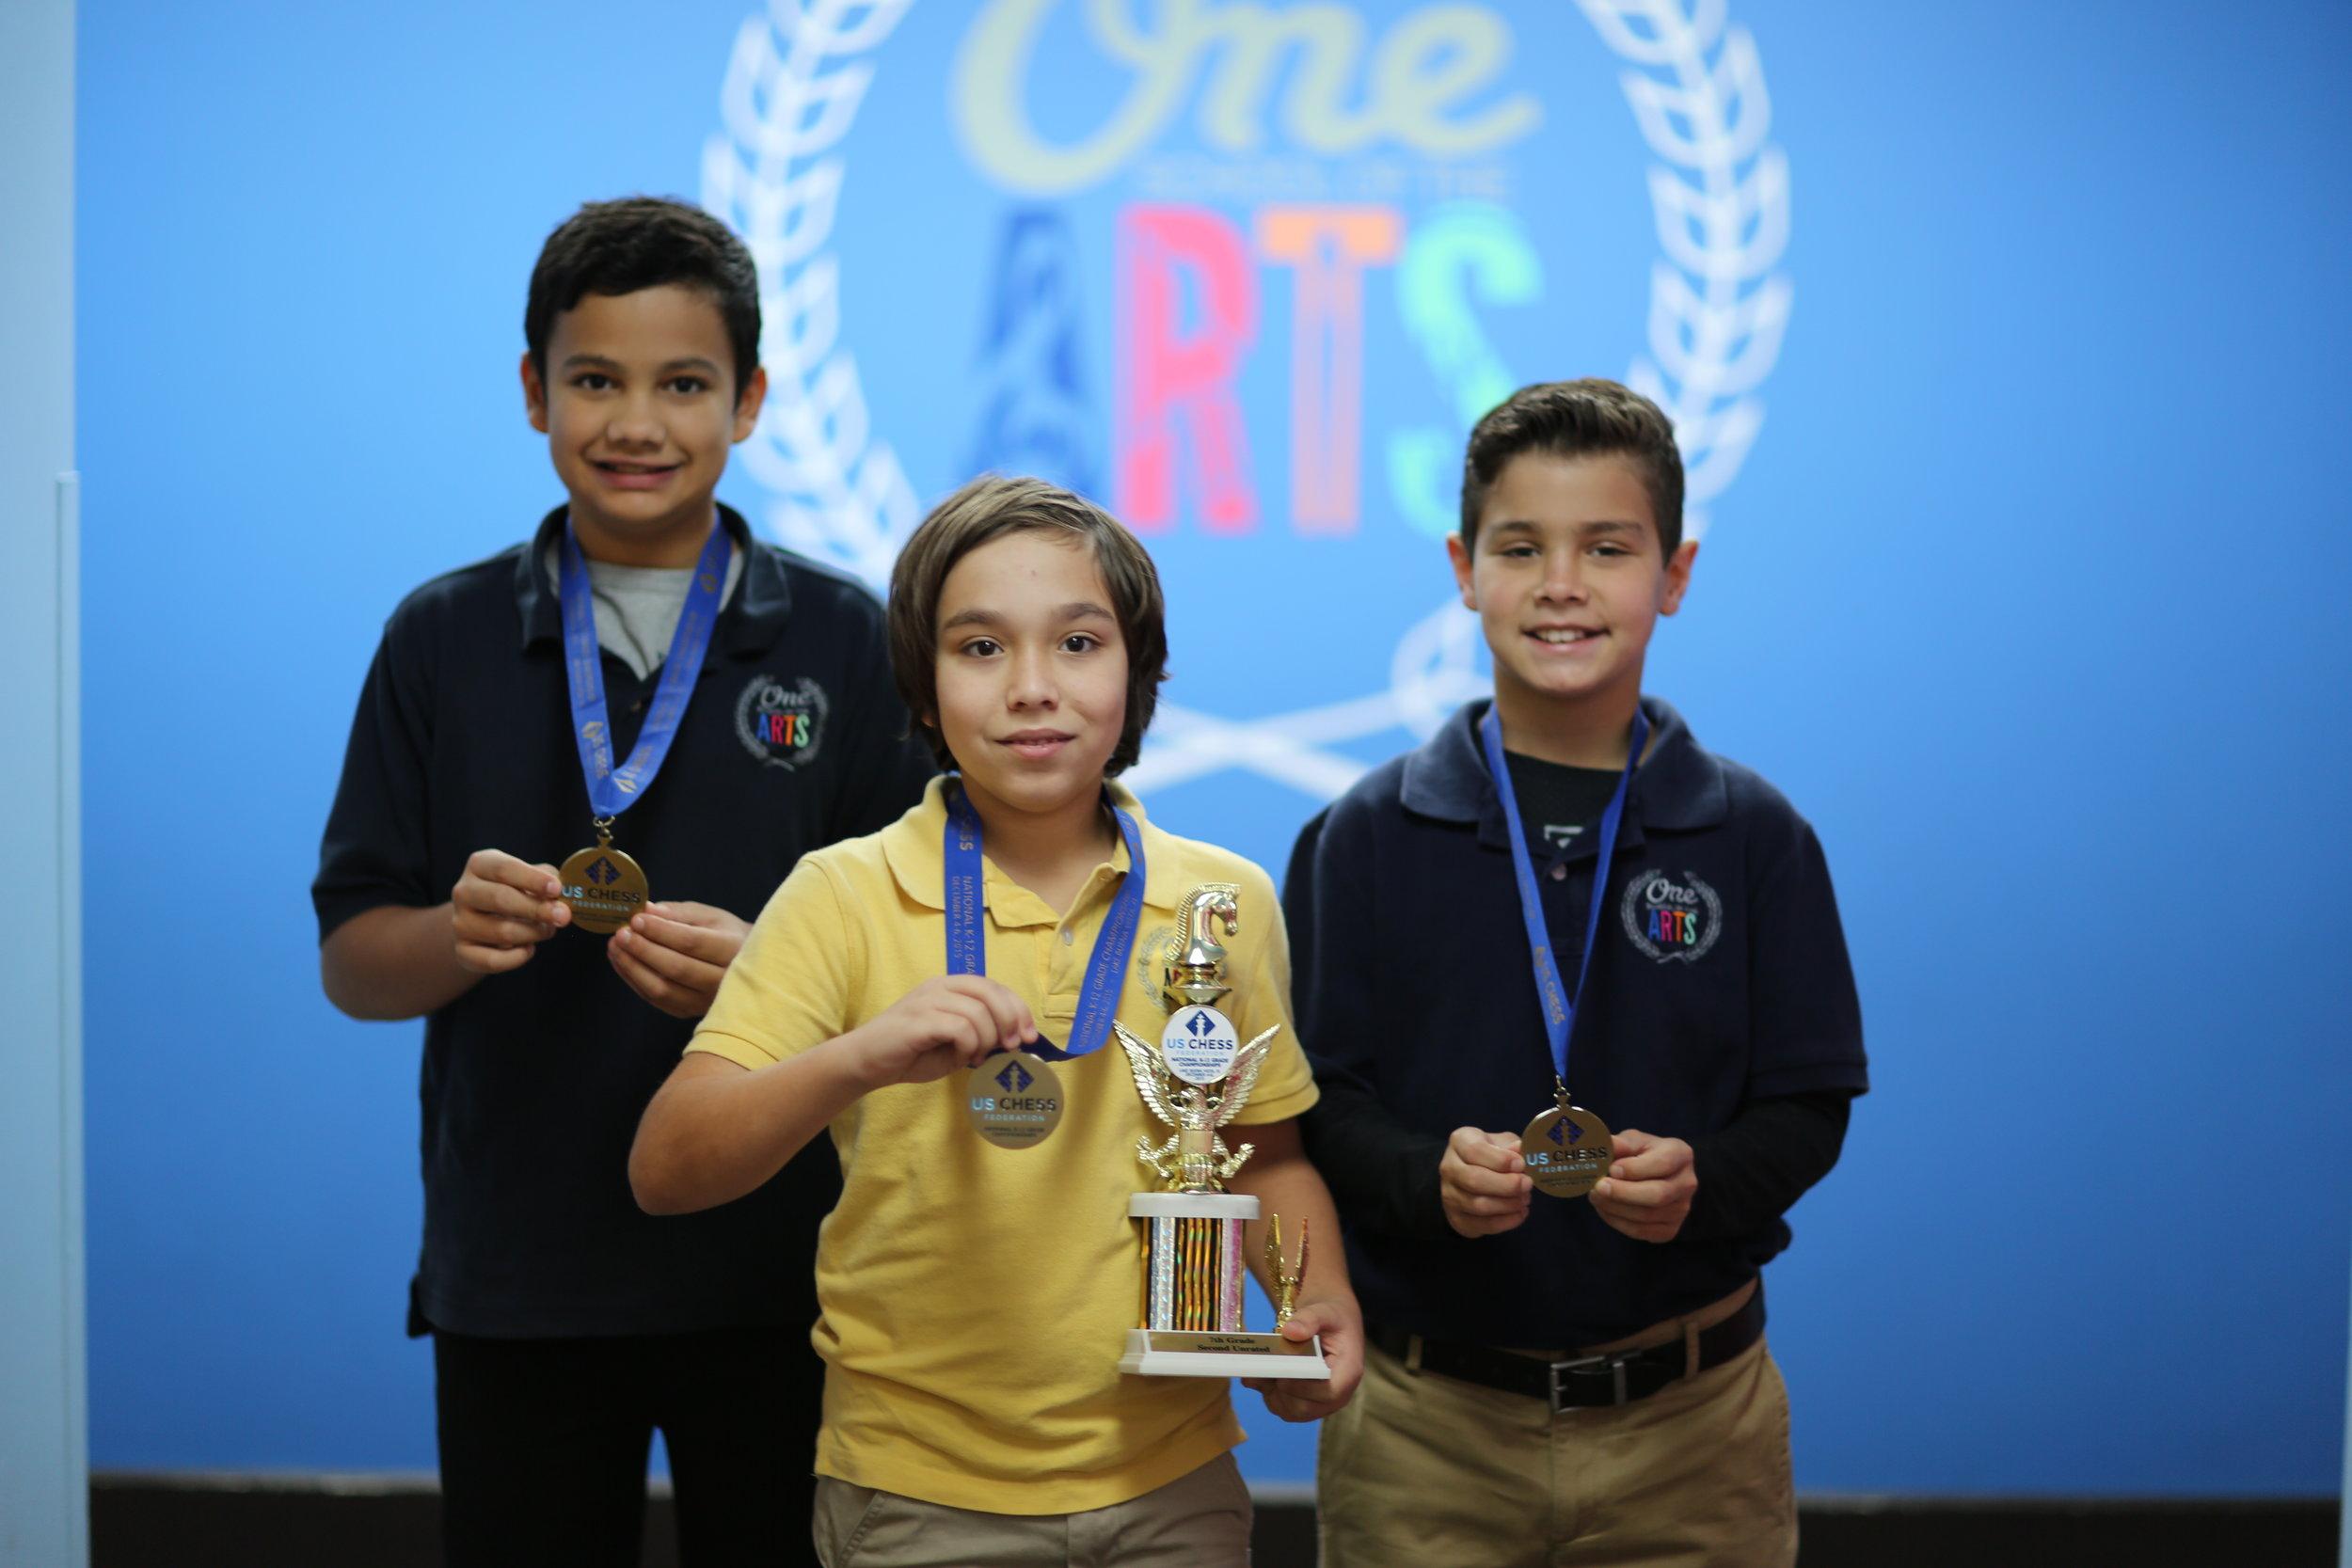 December 2014 - K -12 National Scholastic Chess Championships